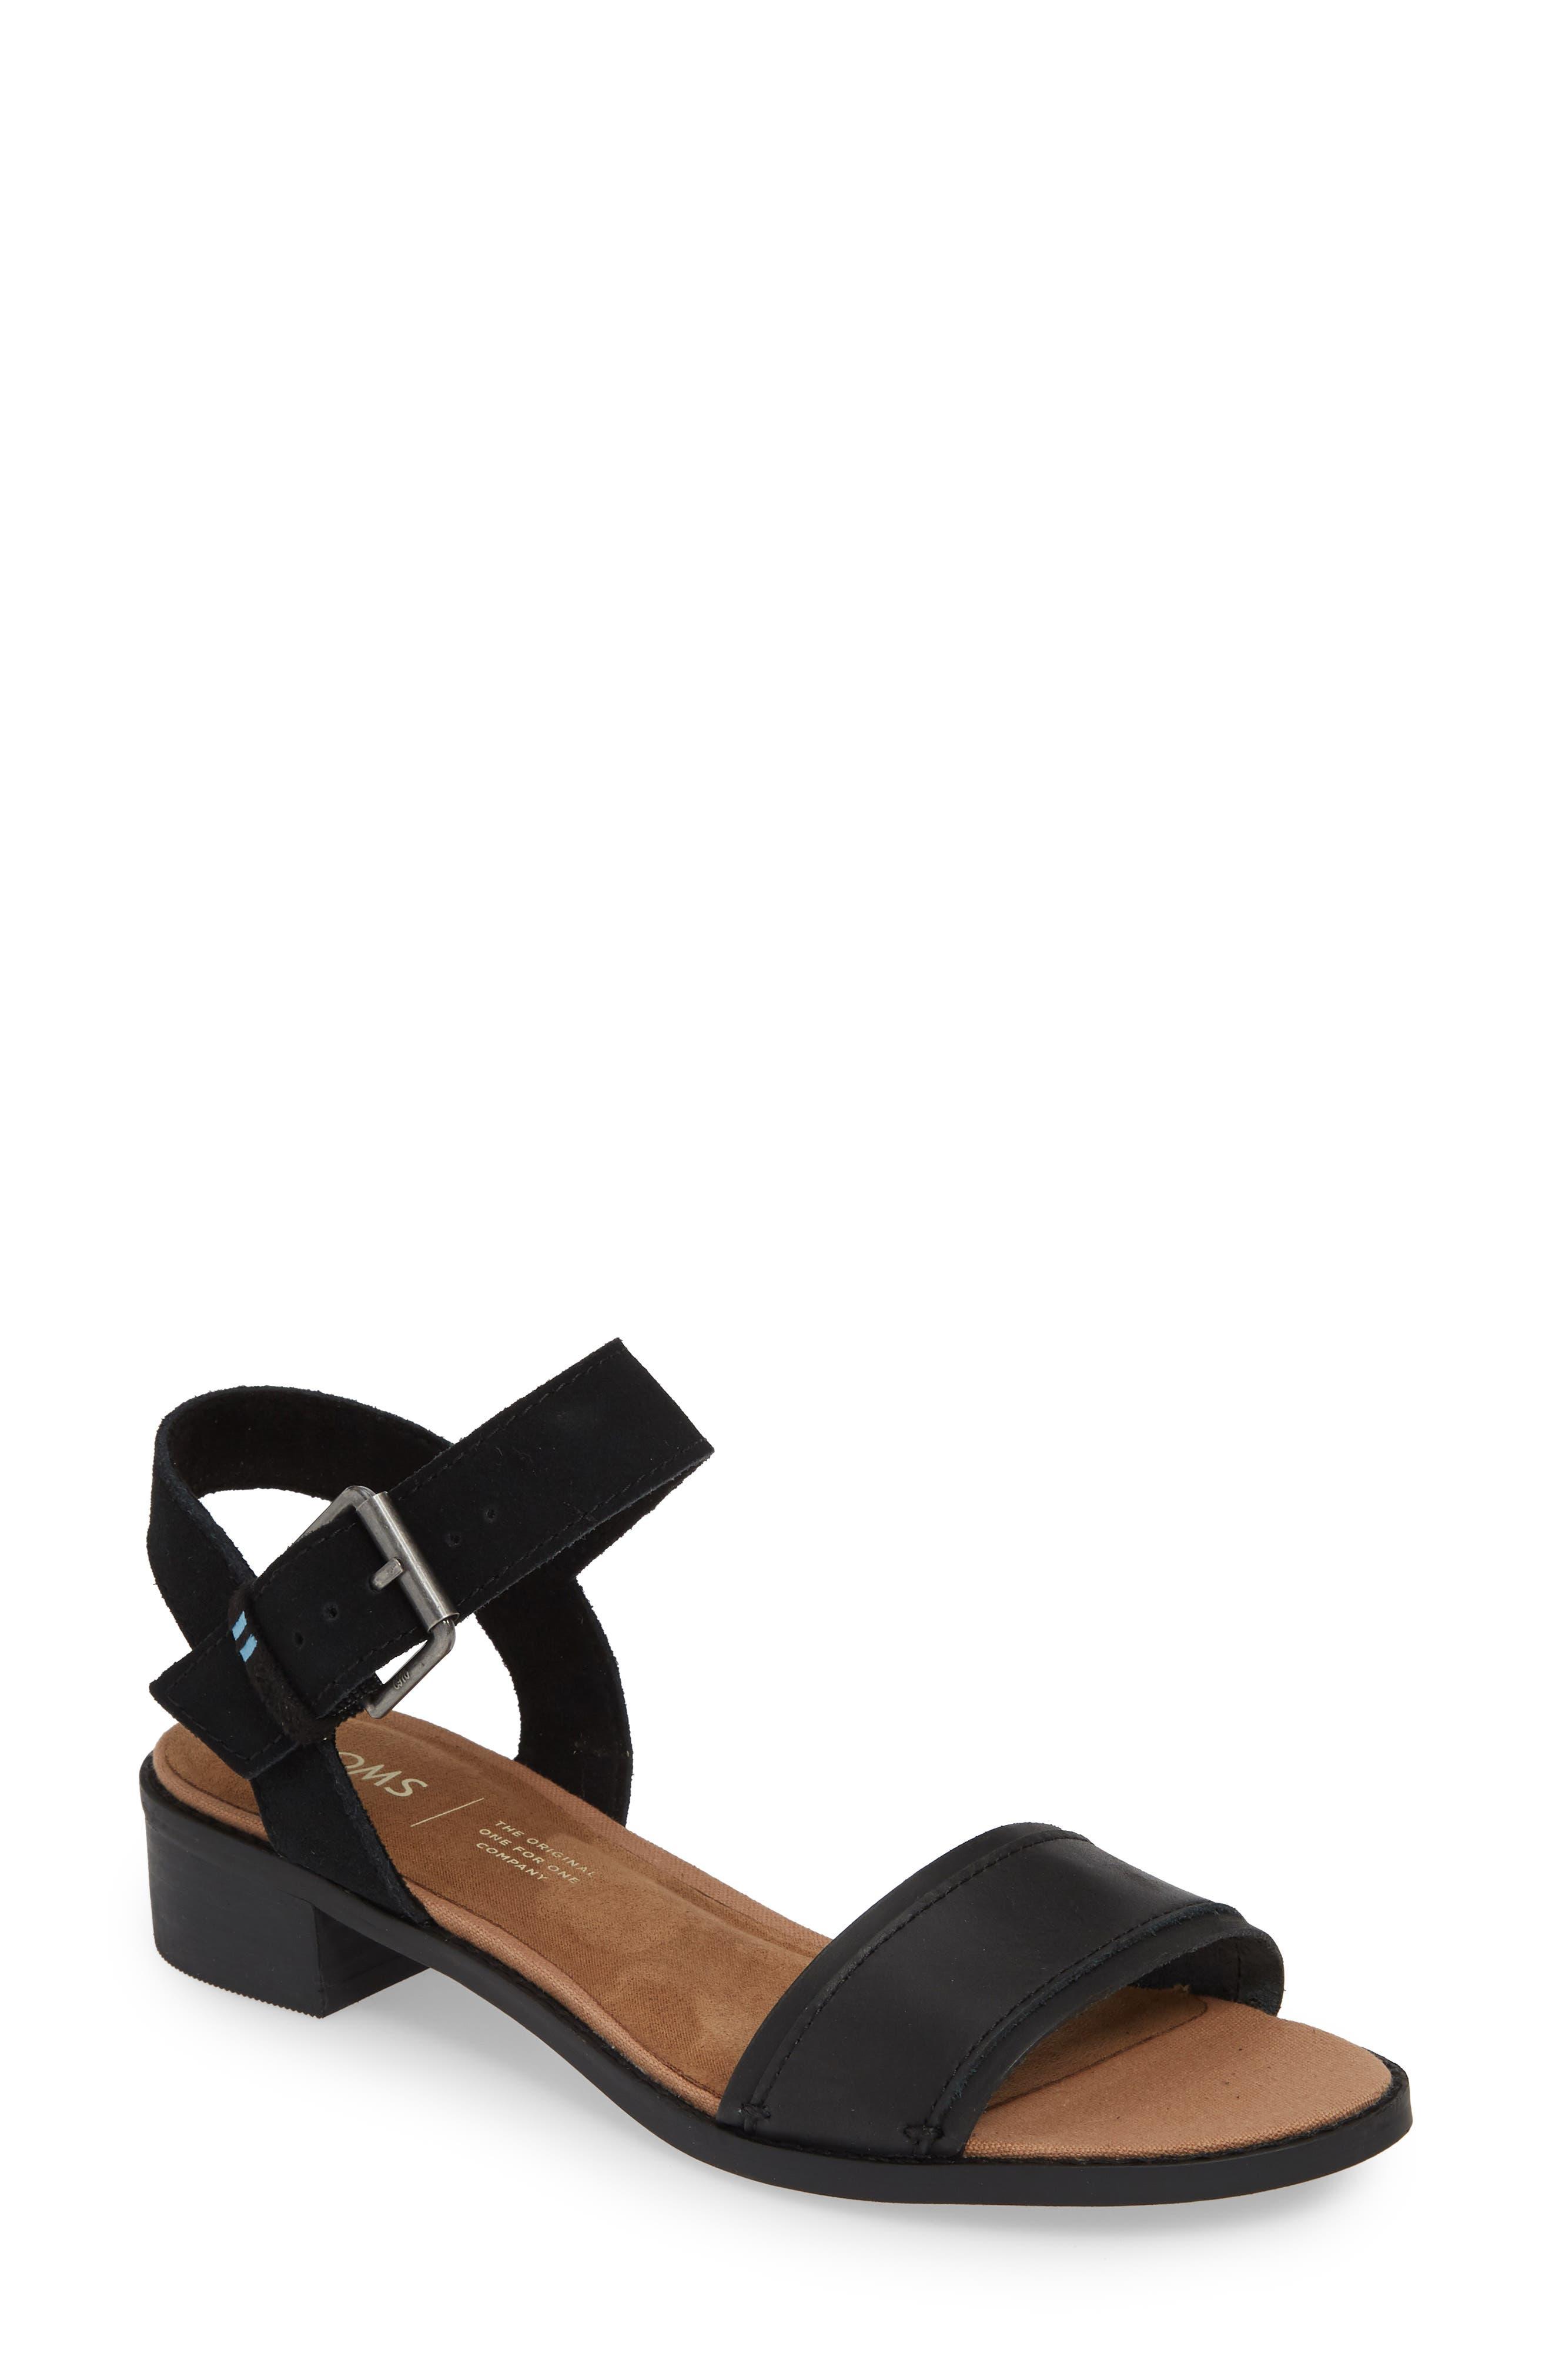 6f4bf9a0a88 TOMS Women s Sandals